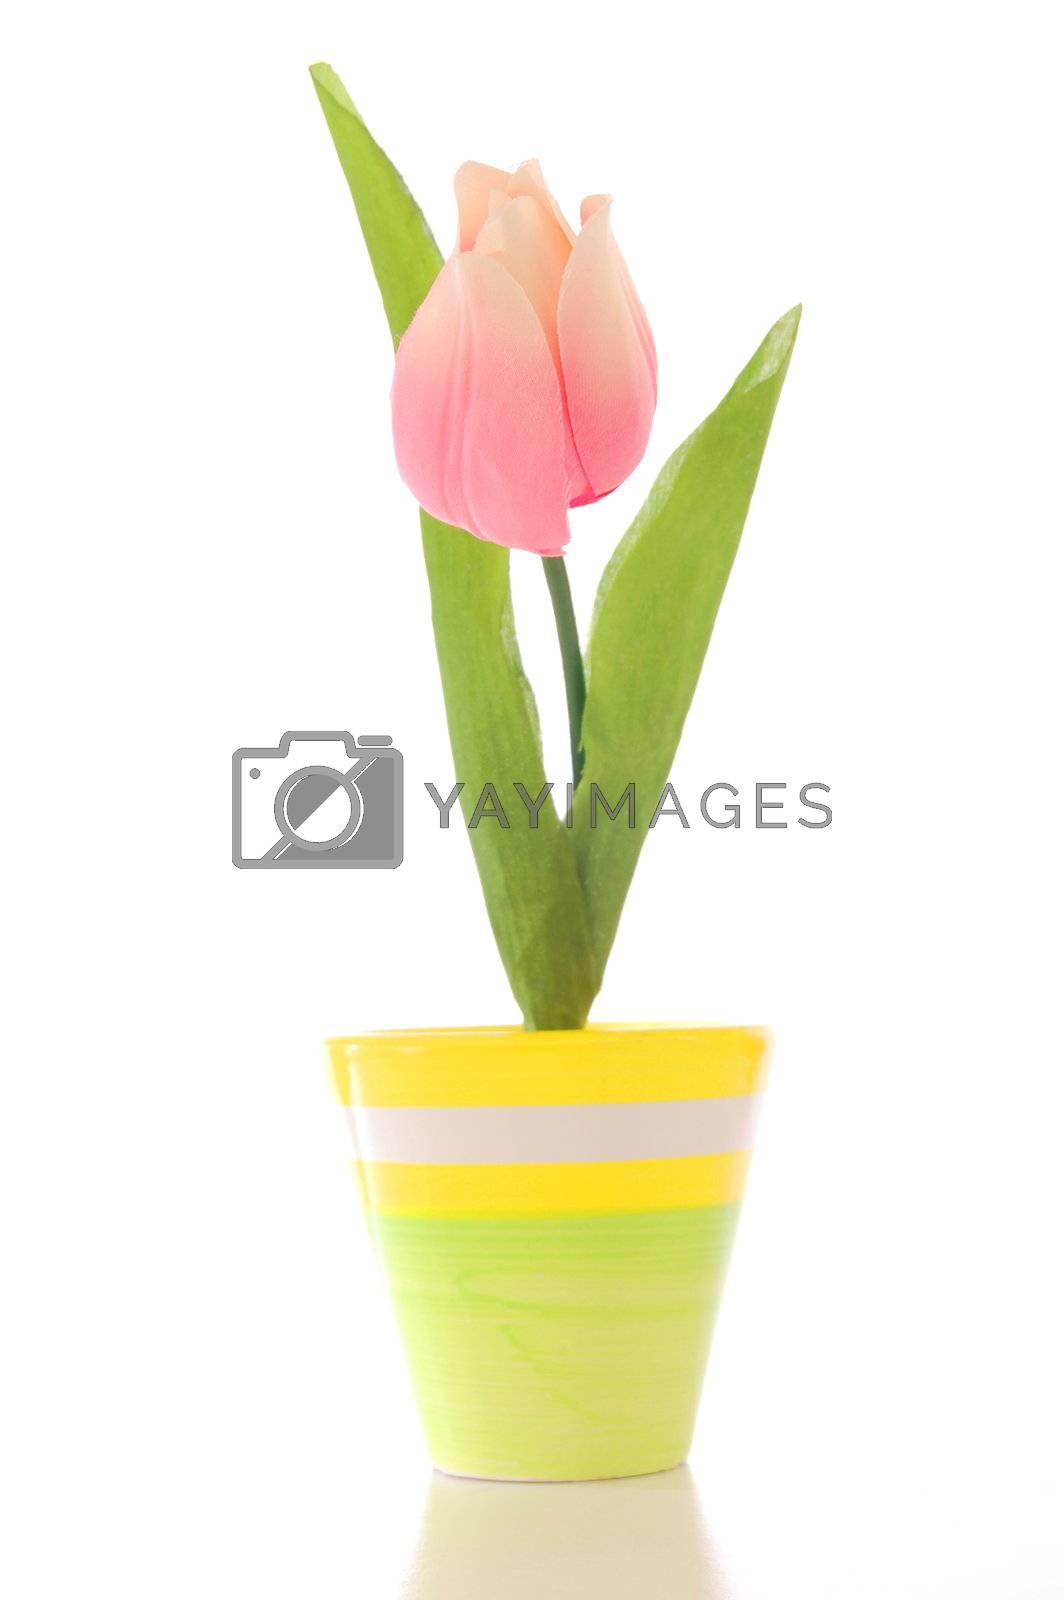 beautyful summer flower in pot with copyspace